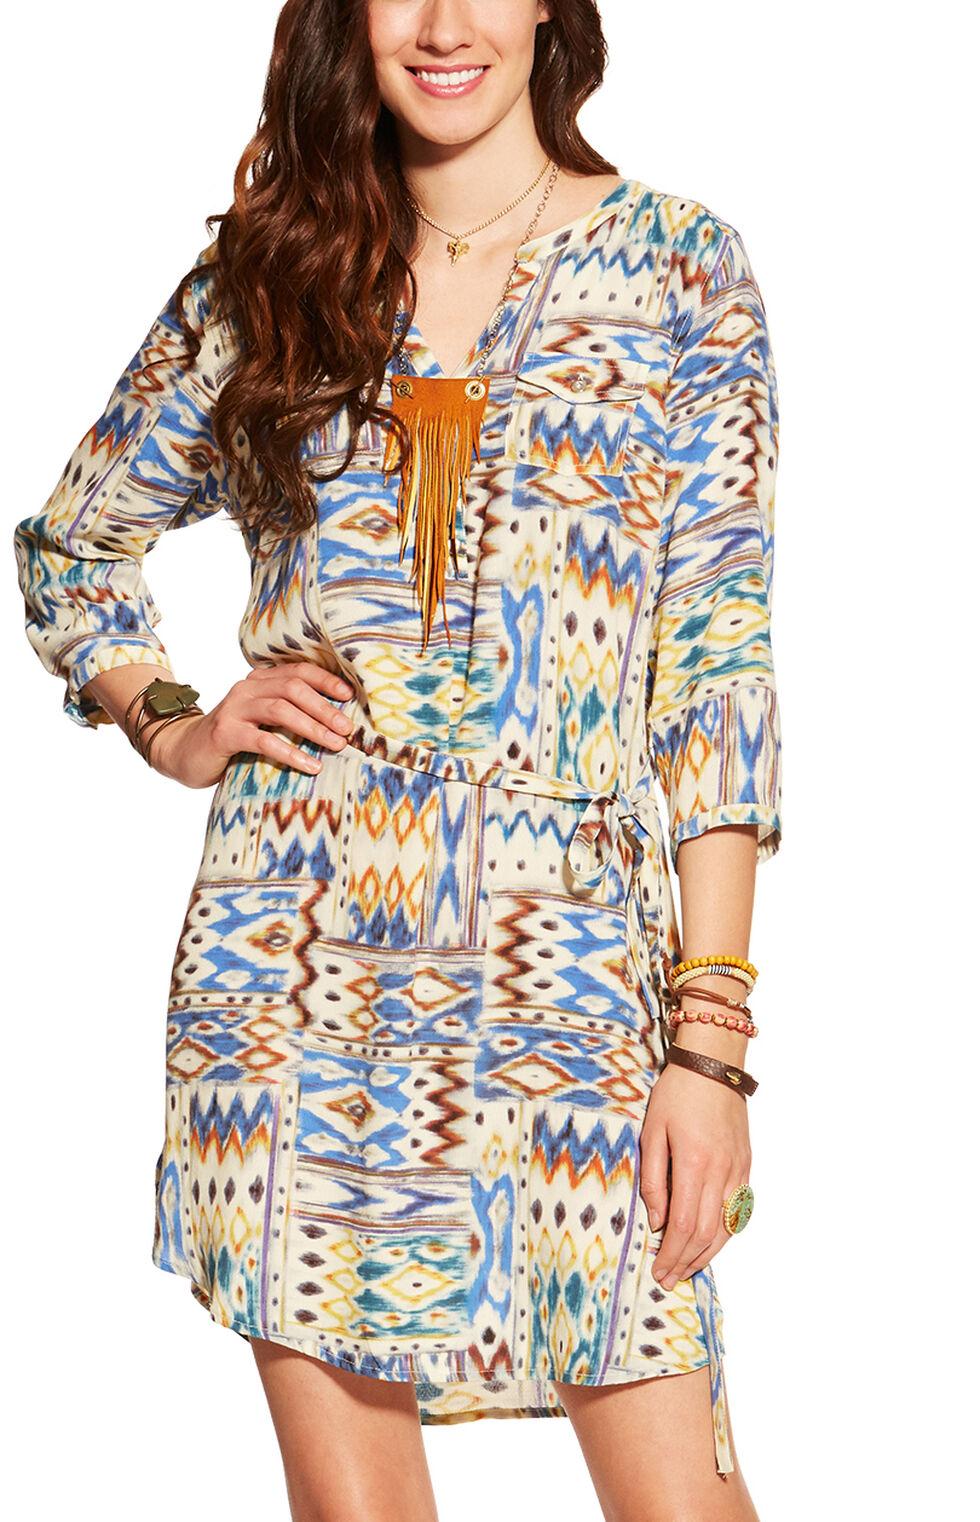 Ariat Women's Dyna Crepe Print Dress, Multi, hi-res